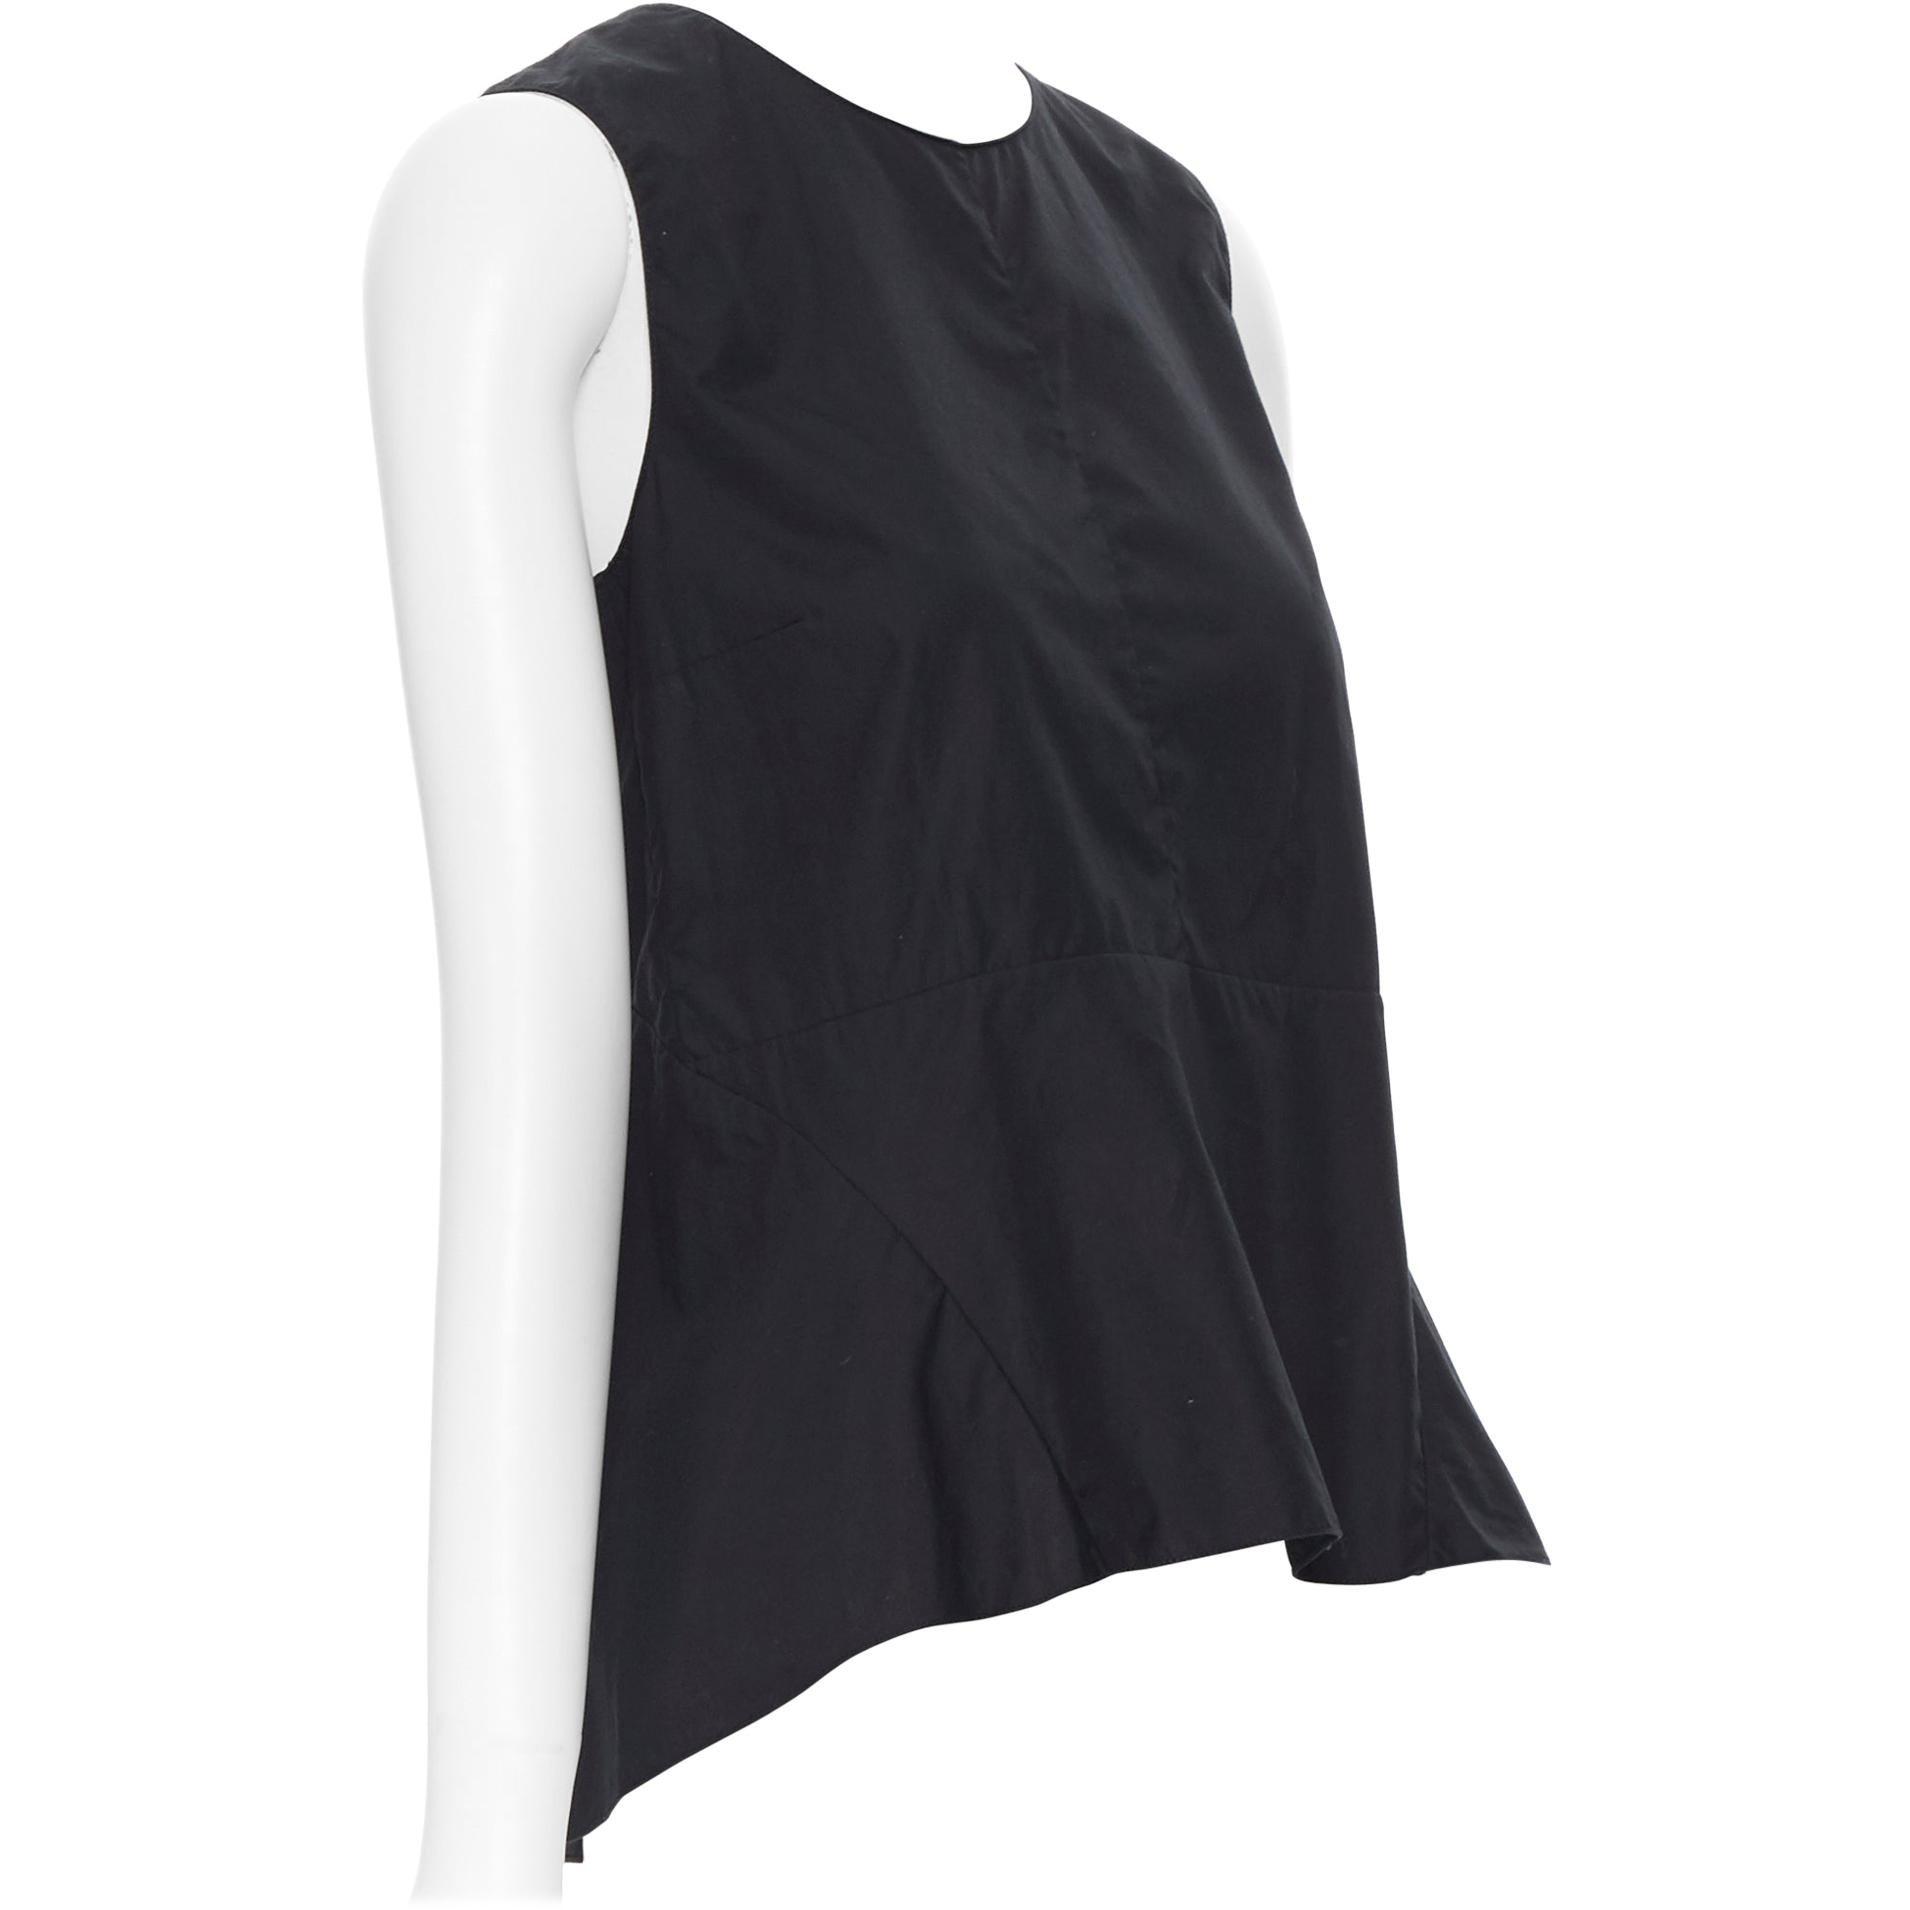 MARNI 100% cotton black curved seam flared hem sleeveless top IT38 XS